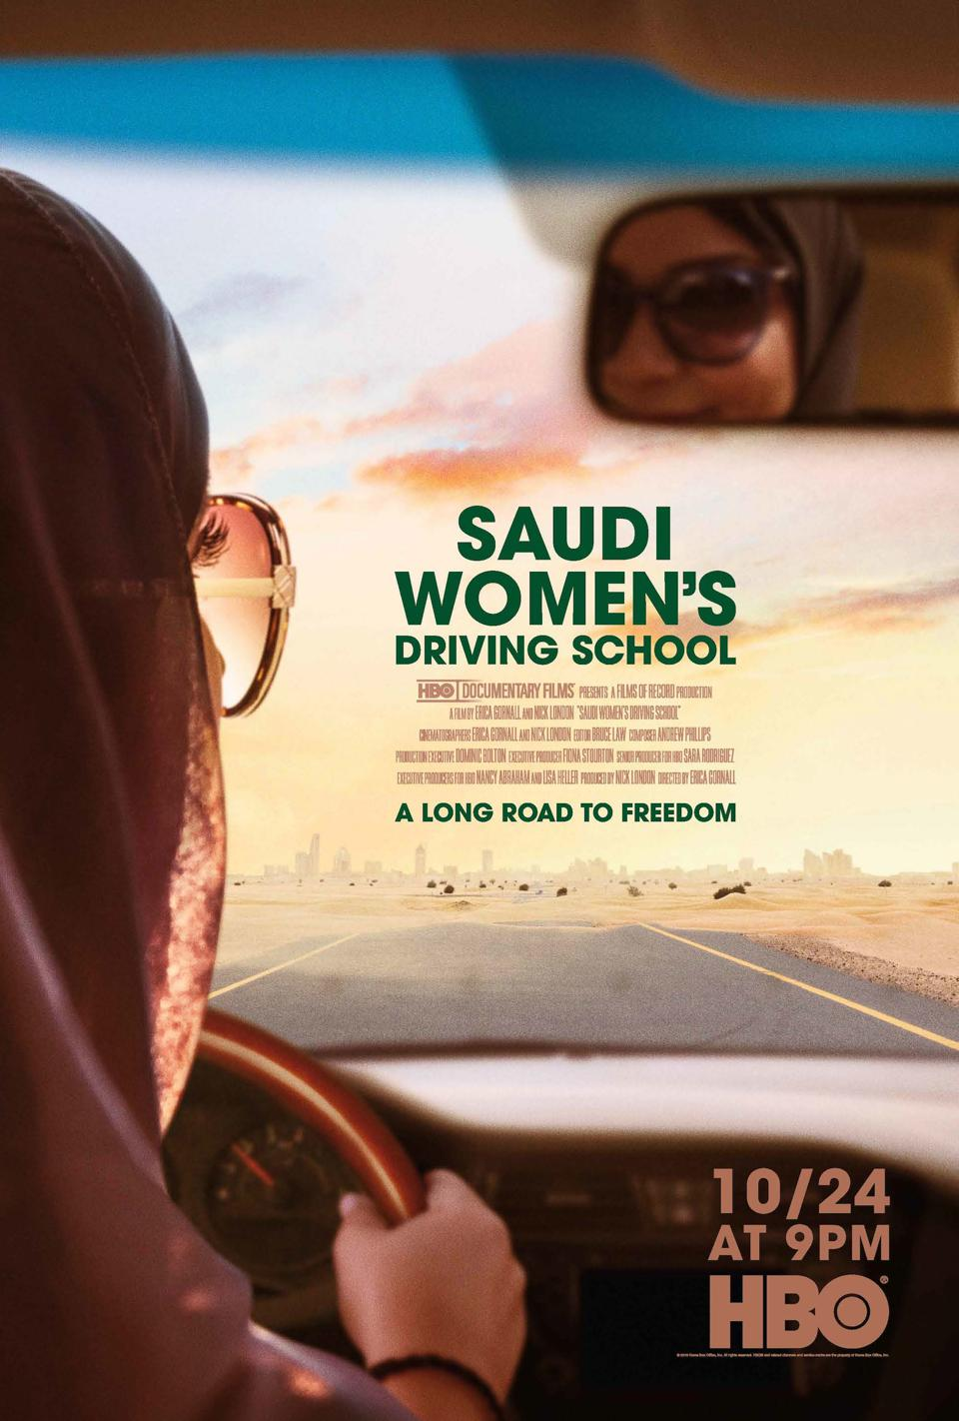 Saudi Women's Driving School Show Art